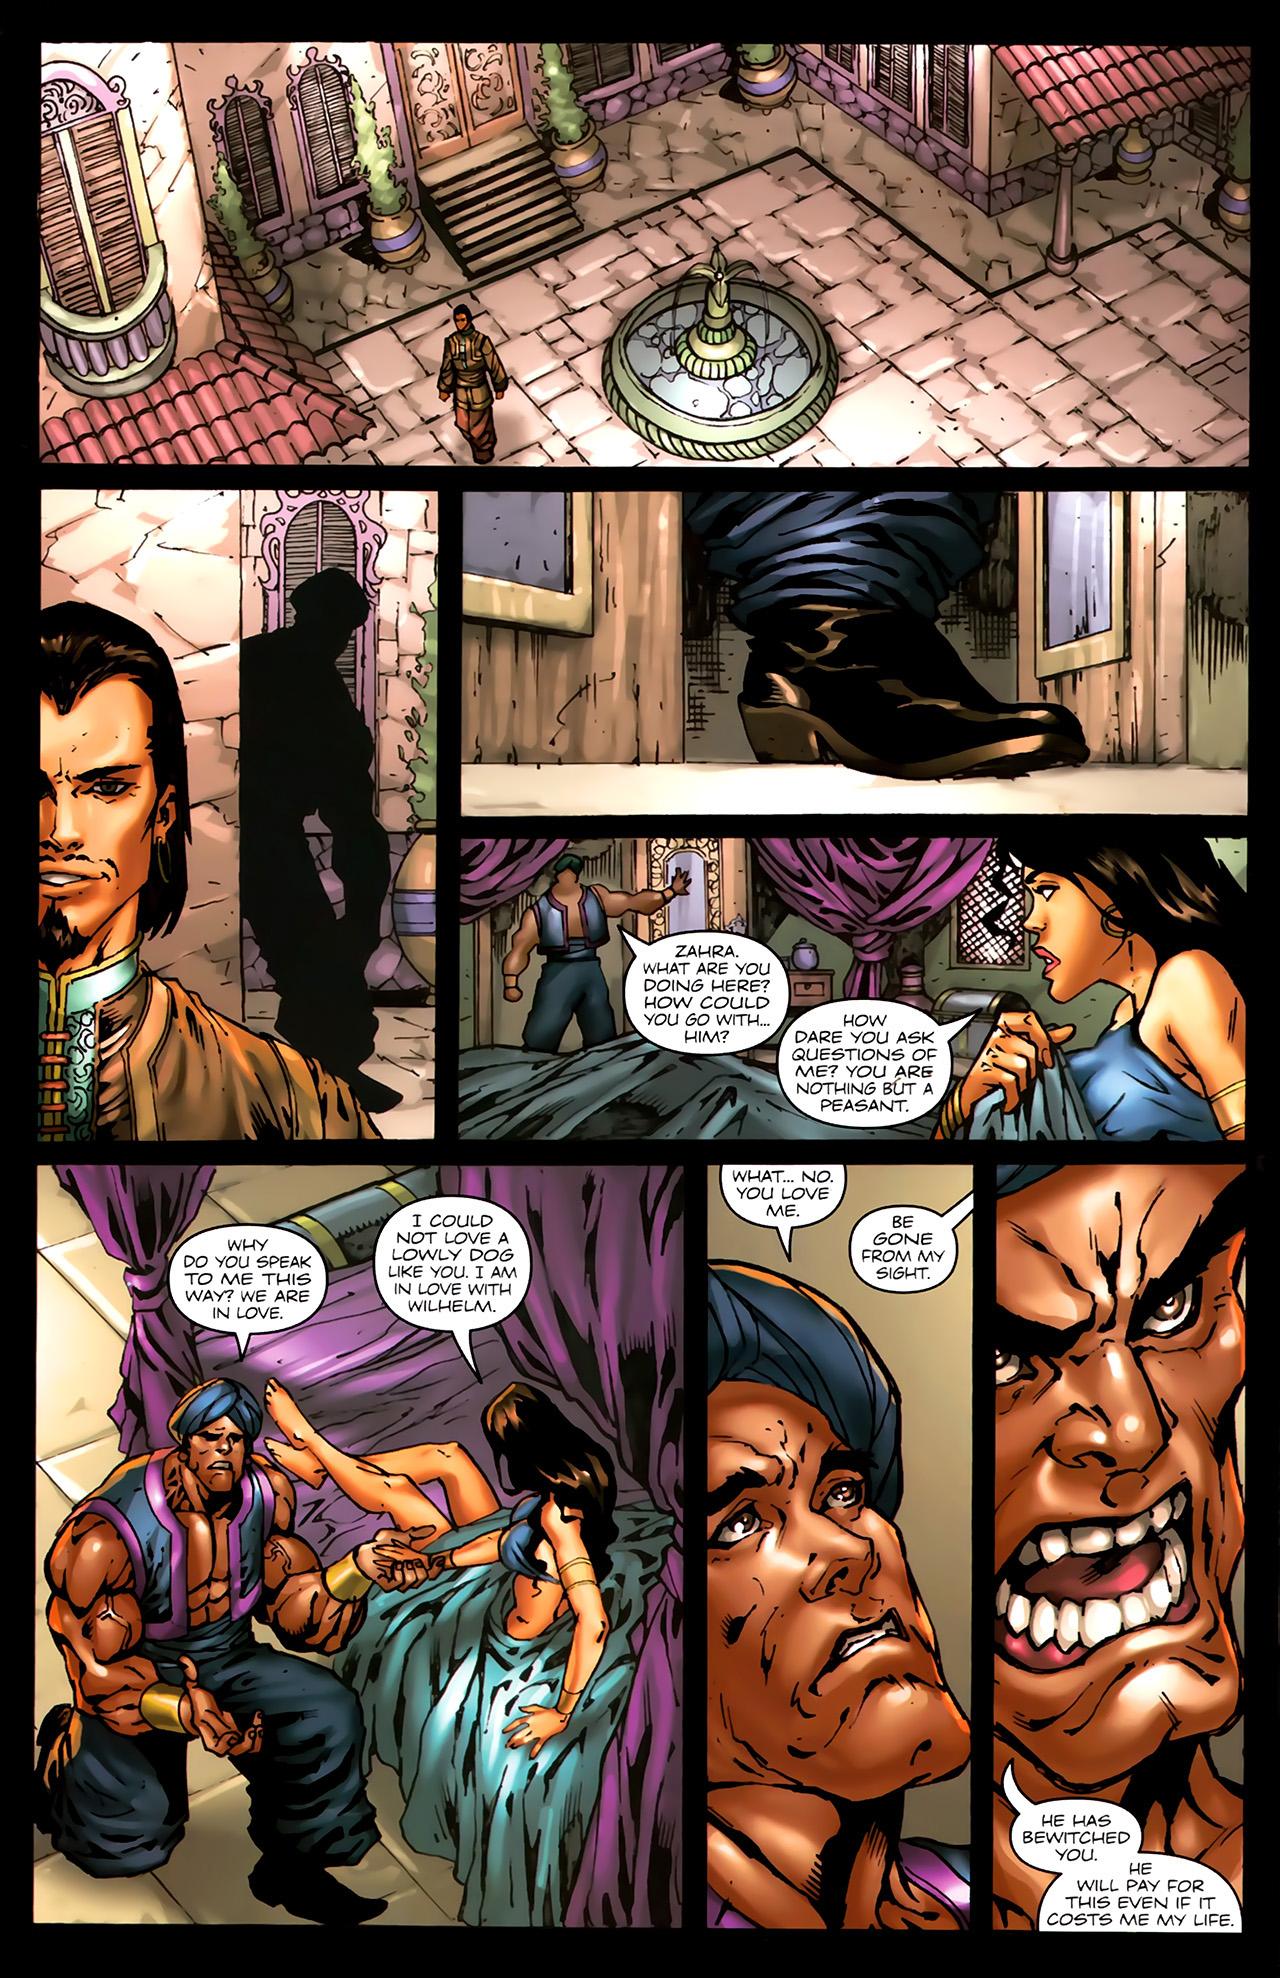 Read online 1001 Arabian Nights: The Adventures of Sinbad comic -  Issue #7 - 17